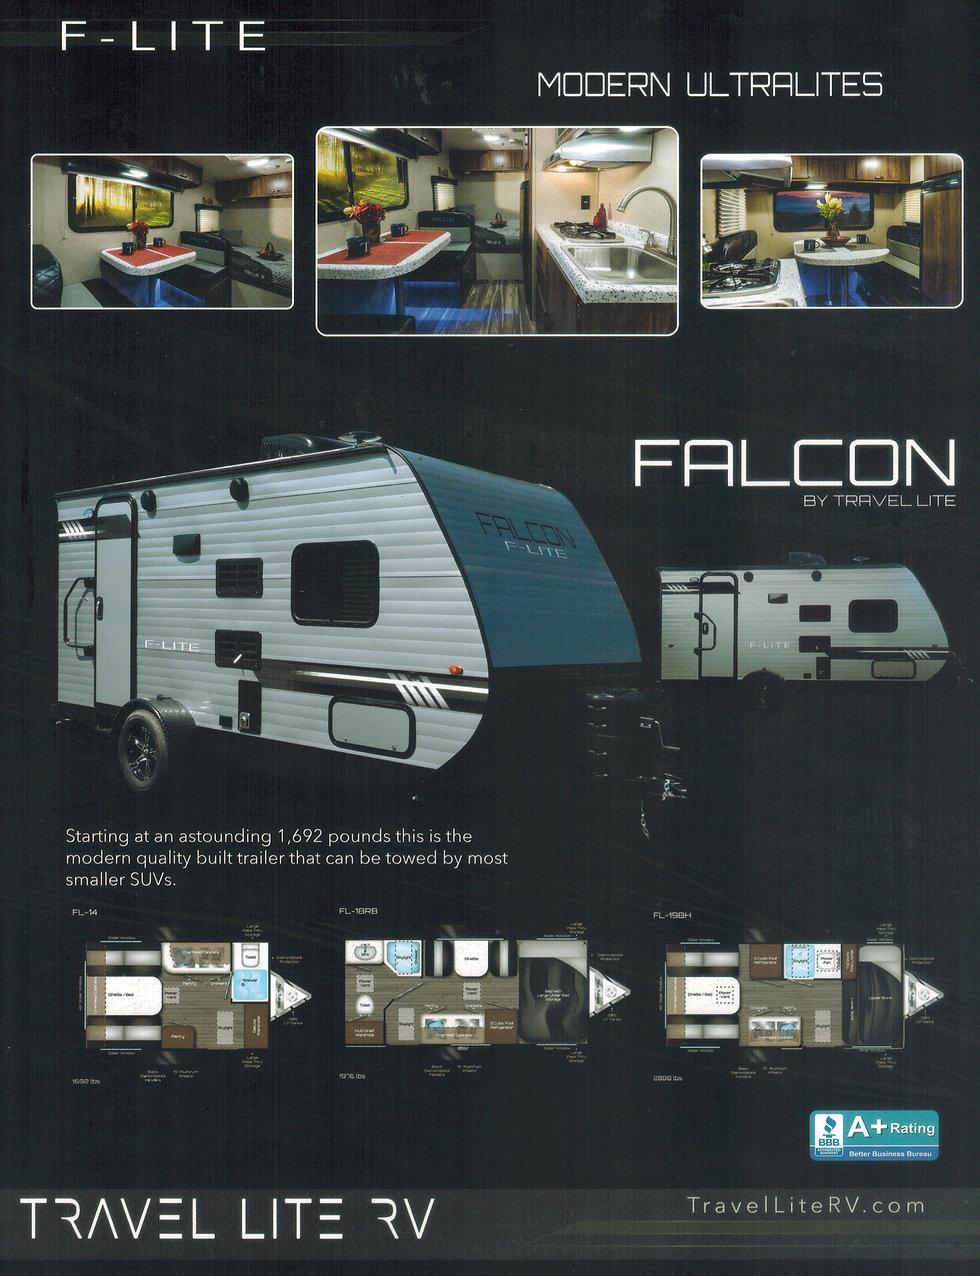 Travel Lite Falcon F-Lite Page 1.jpg